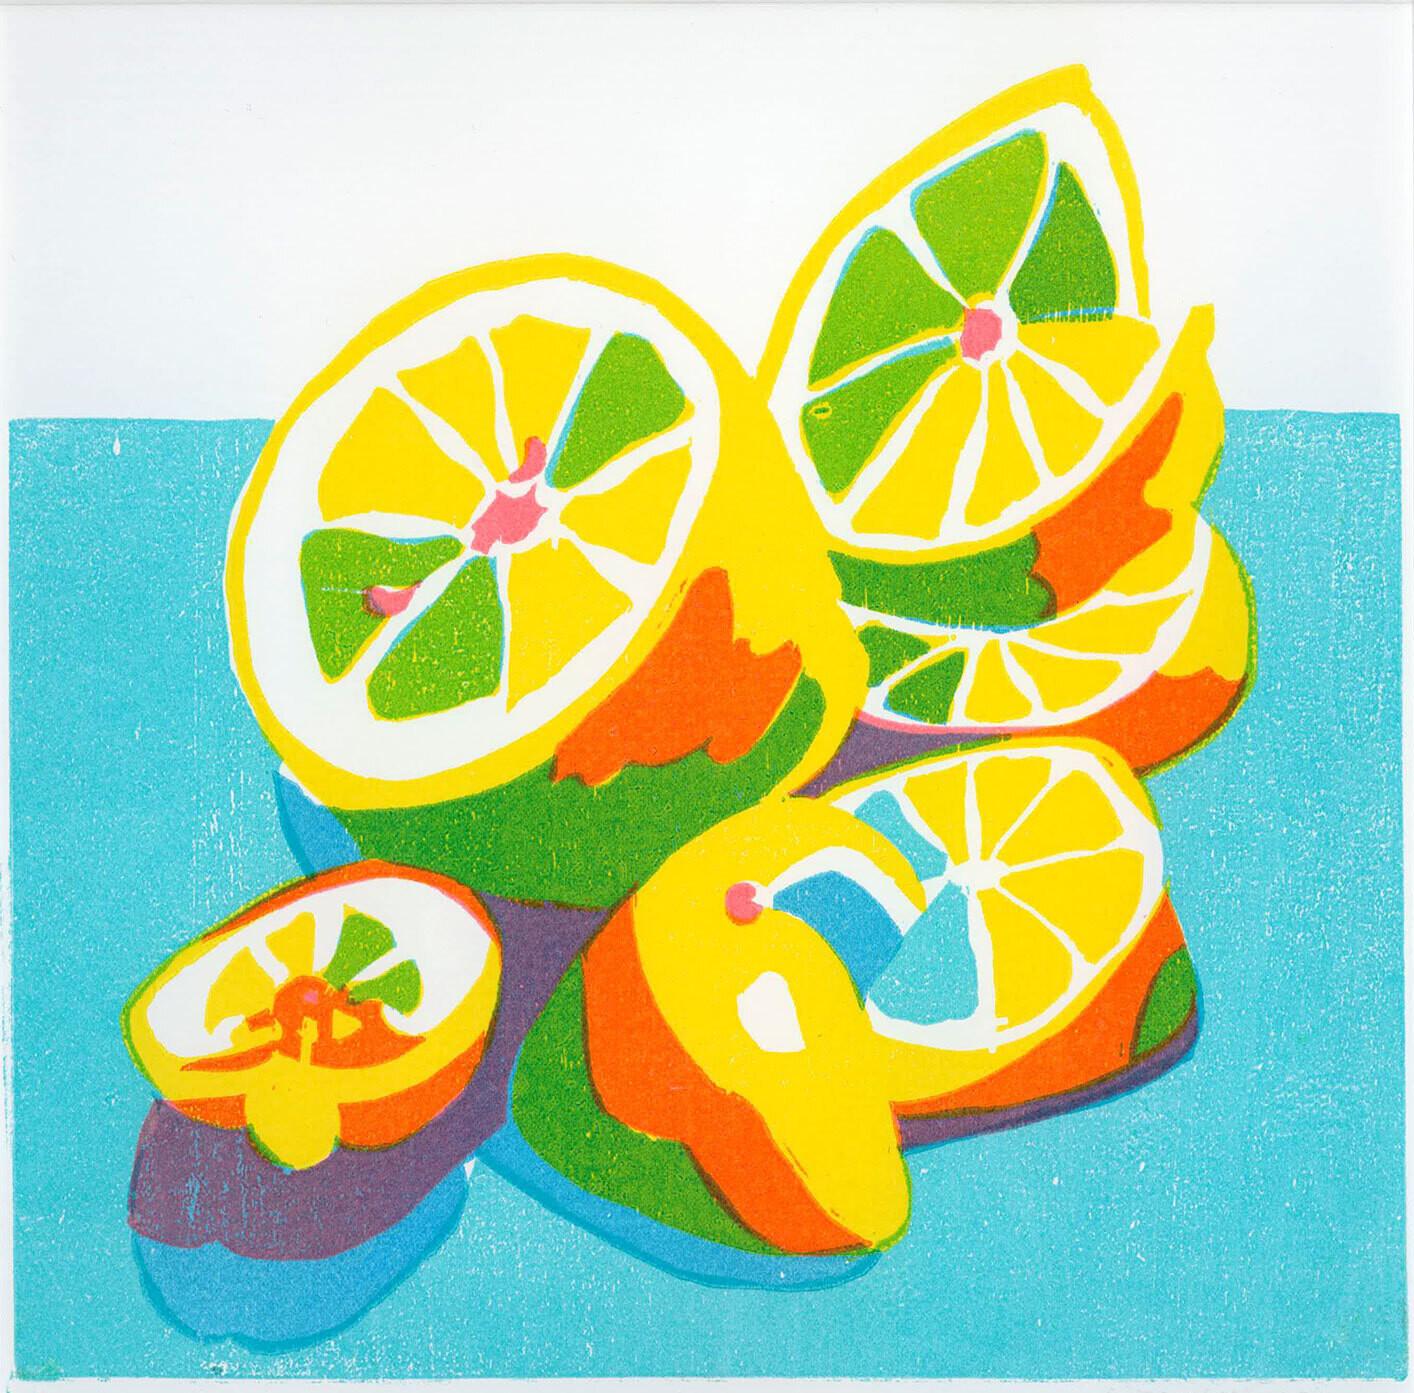 Lemons - Greetings Card